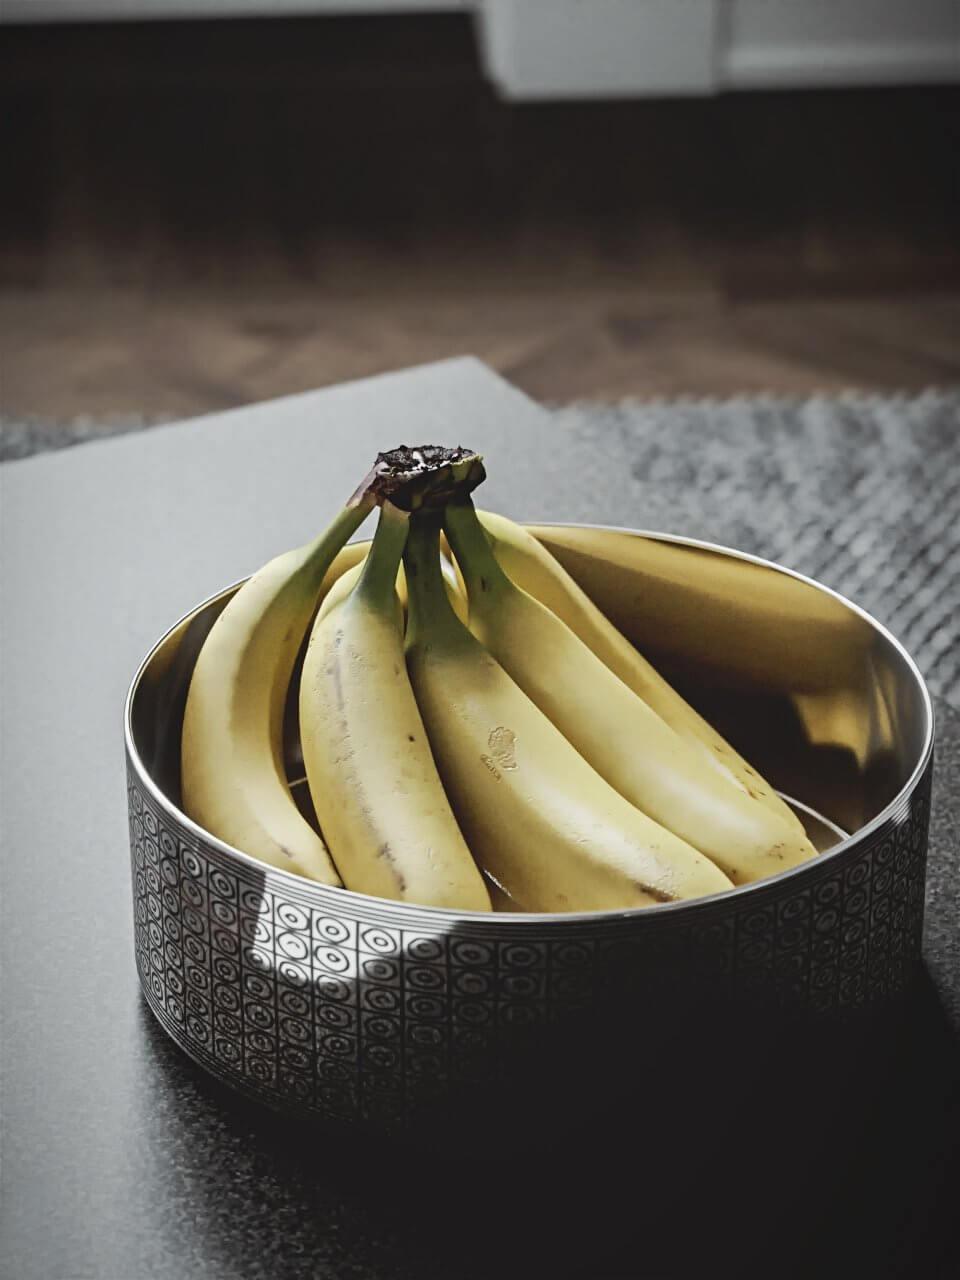 Scandinavian flat detail fruit banane - cgi visualization